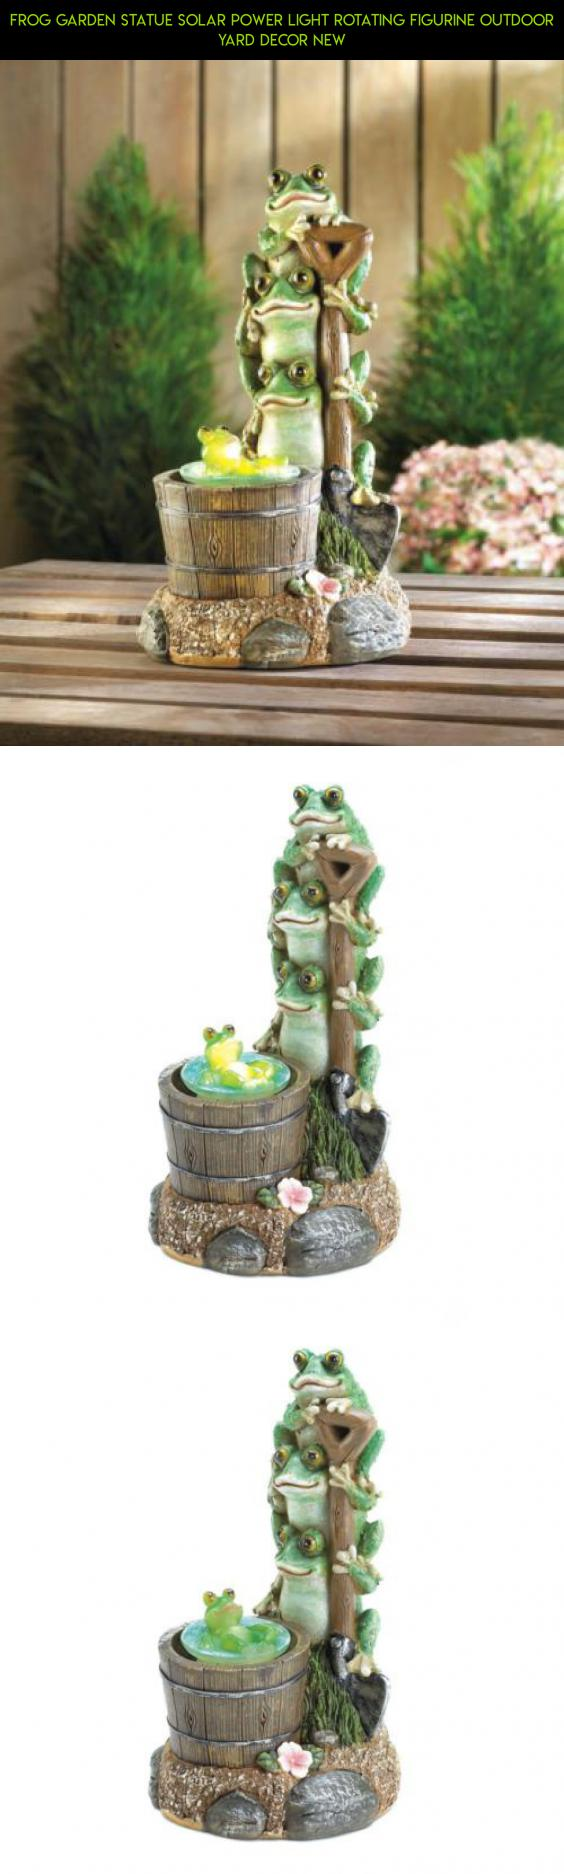 Garden decor statues  Frog Garden Statue Solar Power Light Rotating Figurine Outdoor Yard